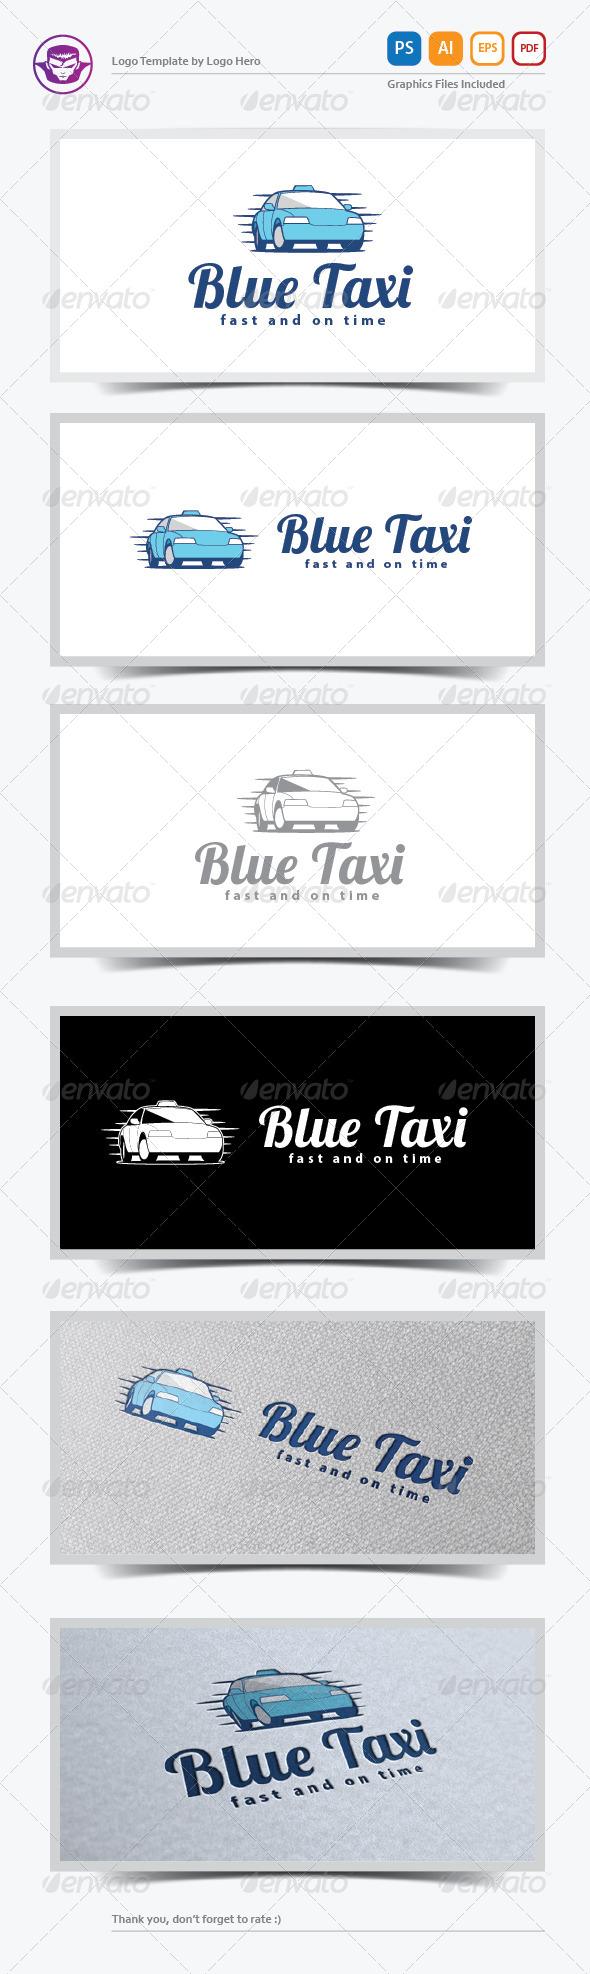 GraphicRiver Blue Taxi Logo Template 5899440